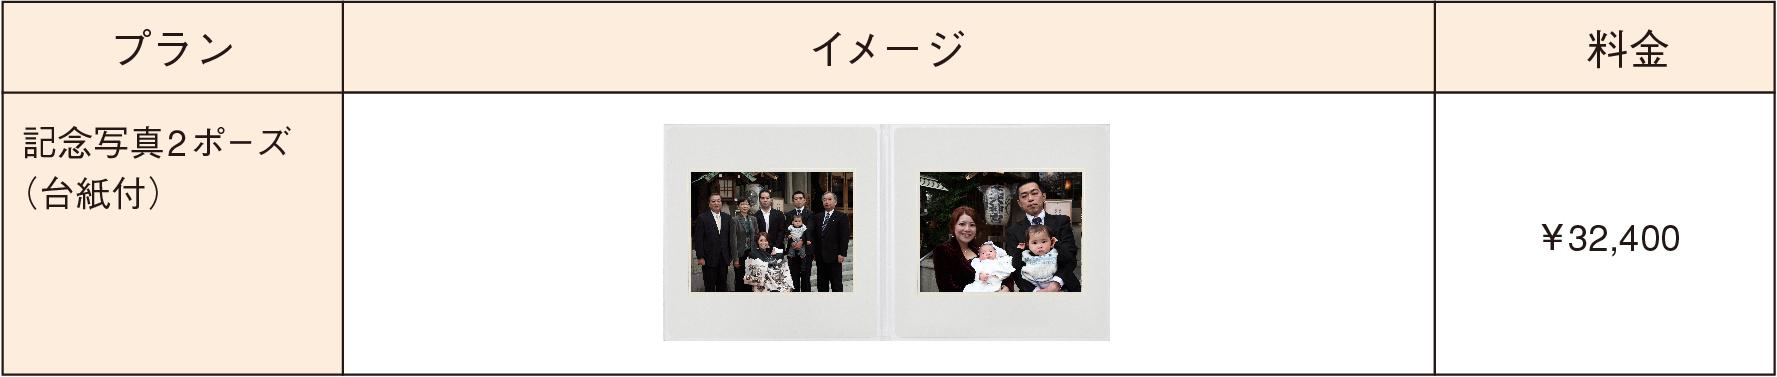 http://www.st-mg.co.jp/Hatsumiya_price.jpg